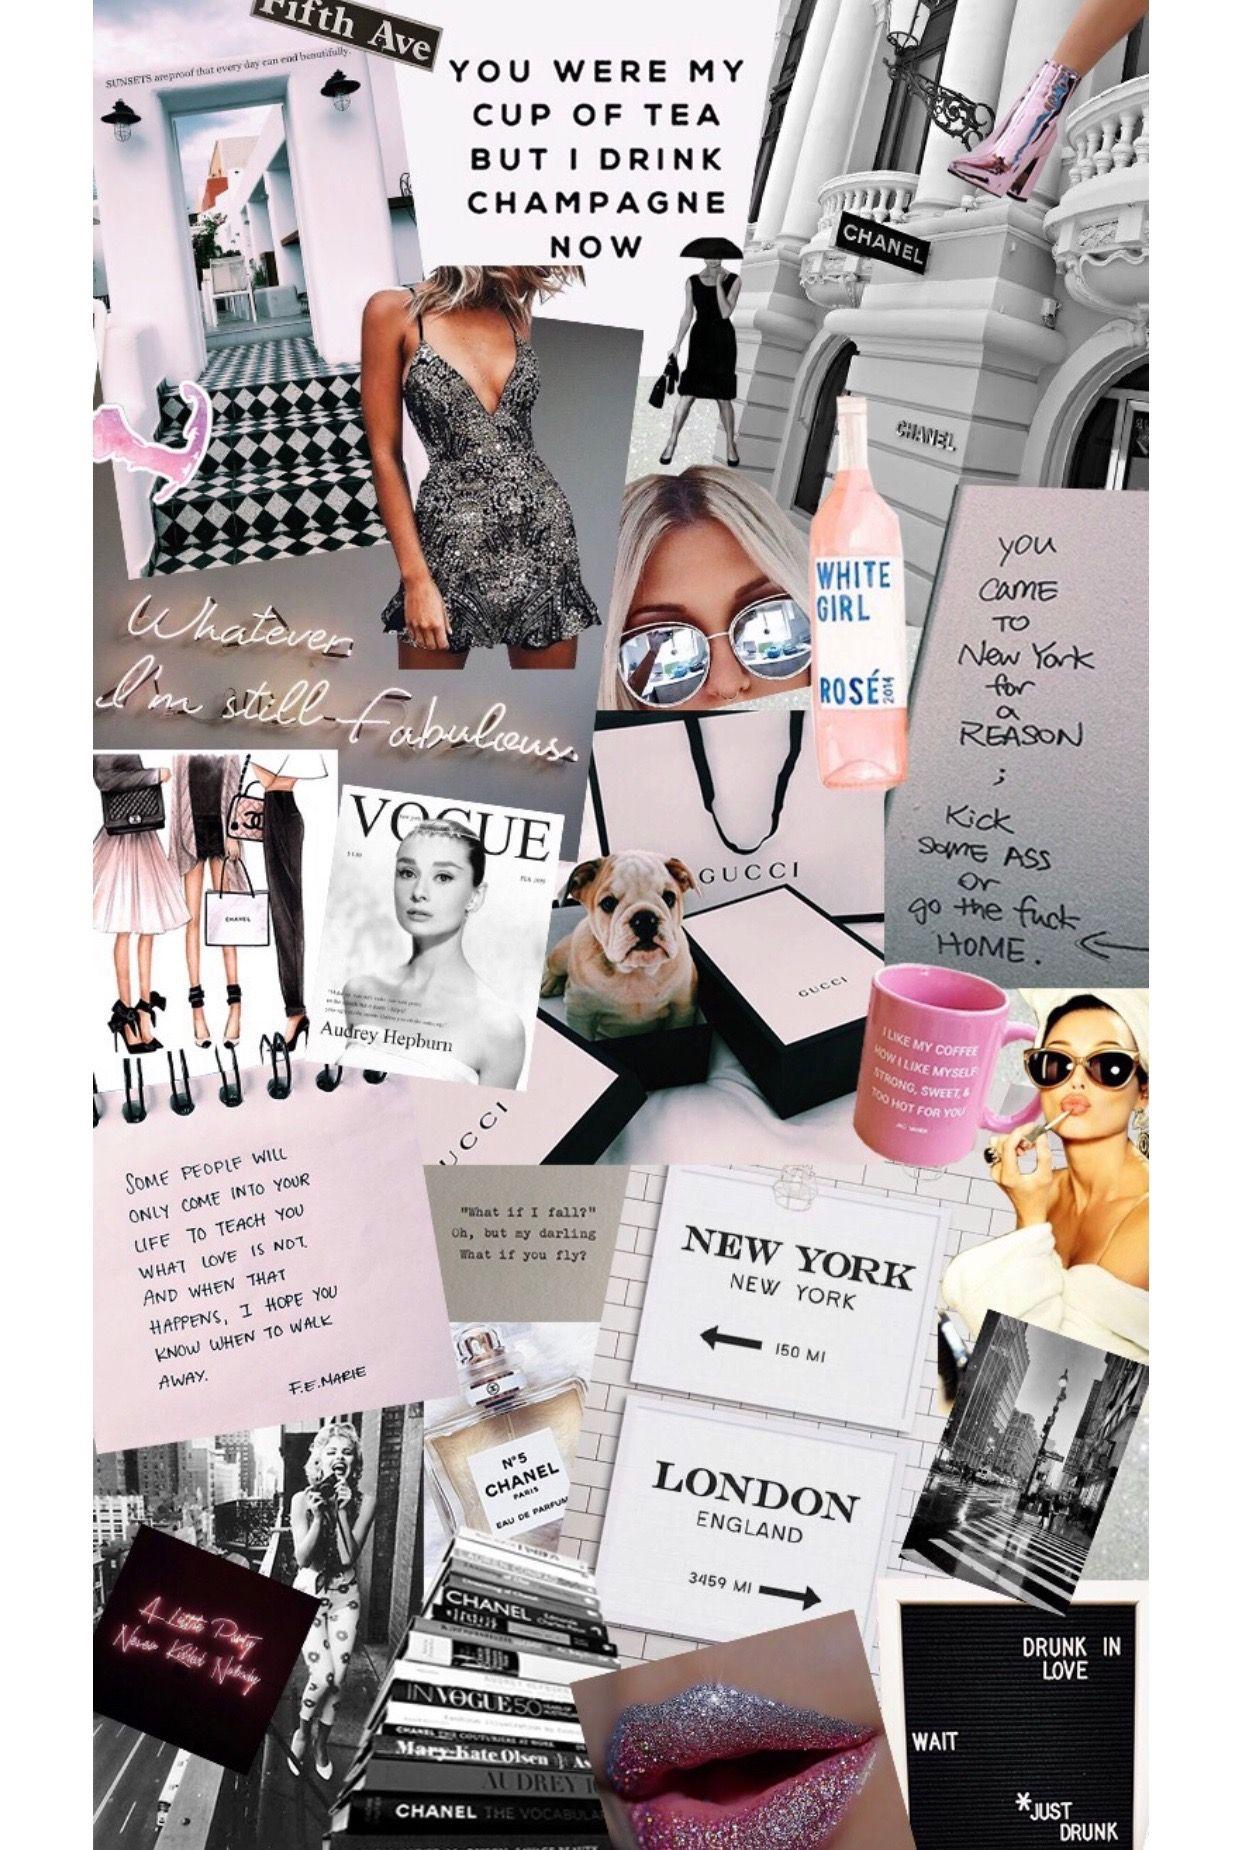 Pin By Peyton Flaherty On Random Inspo Vogue Wallpaper